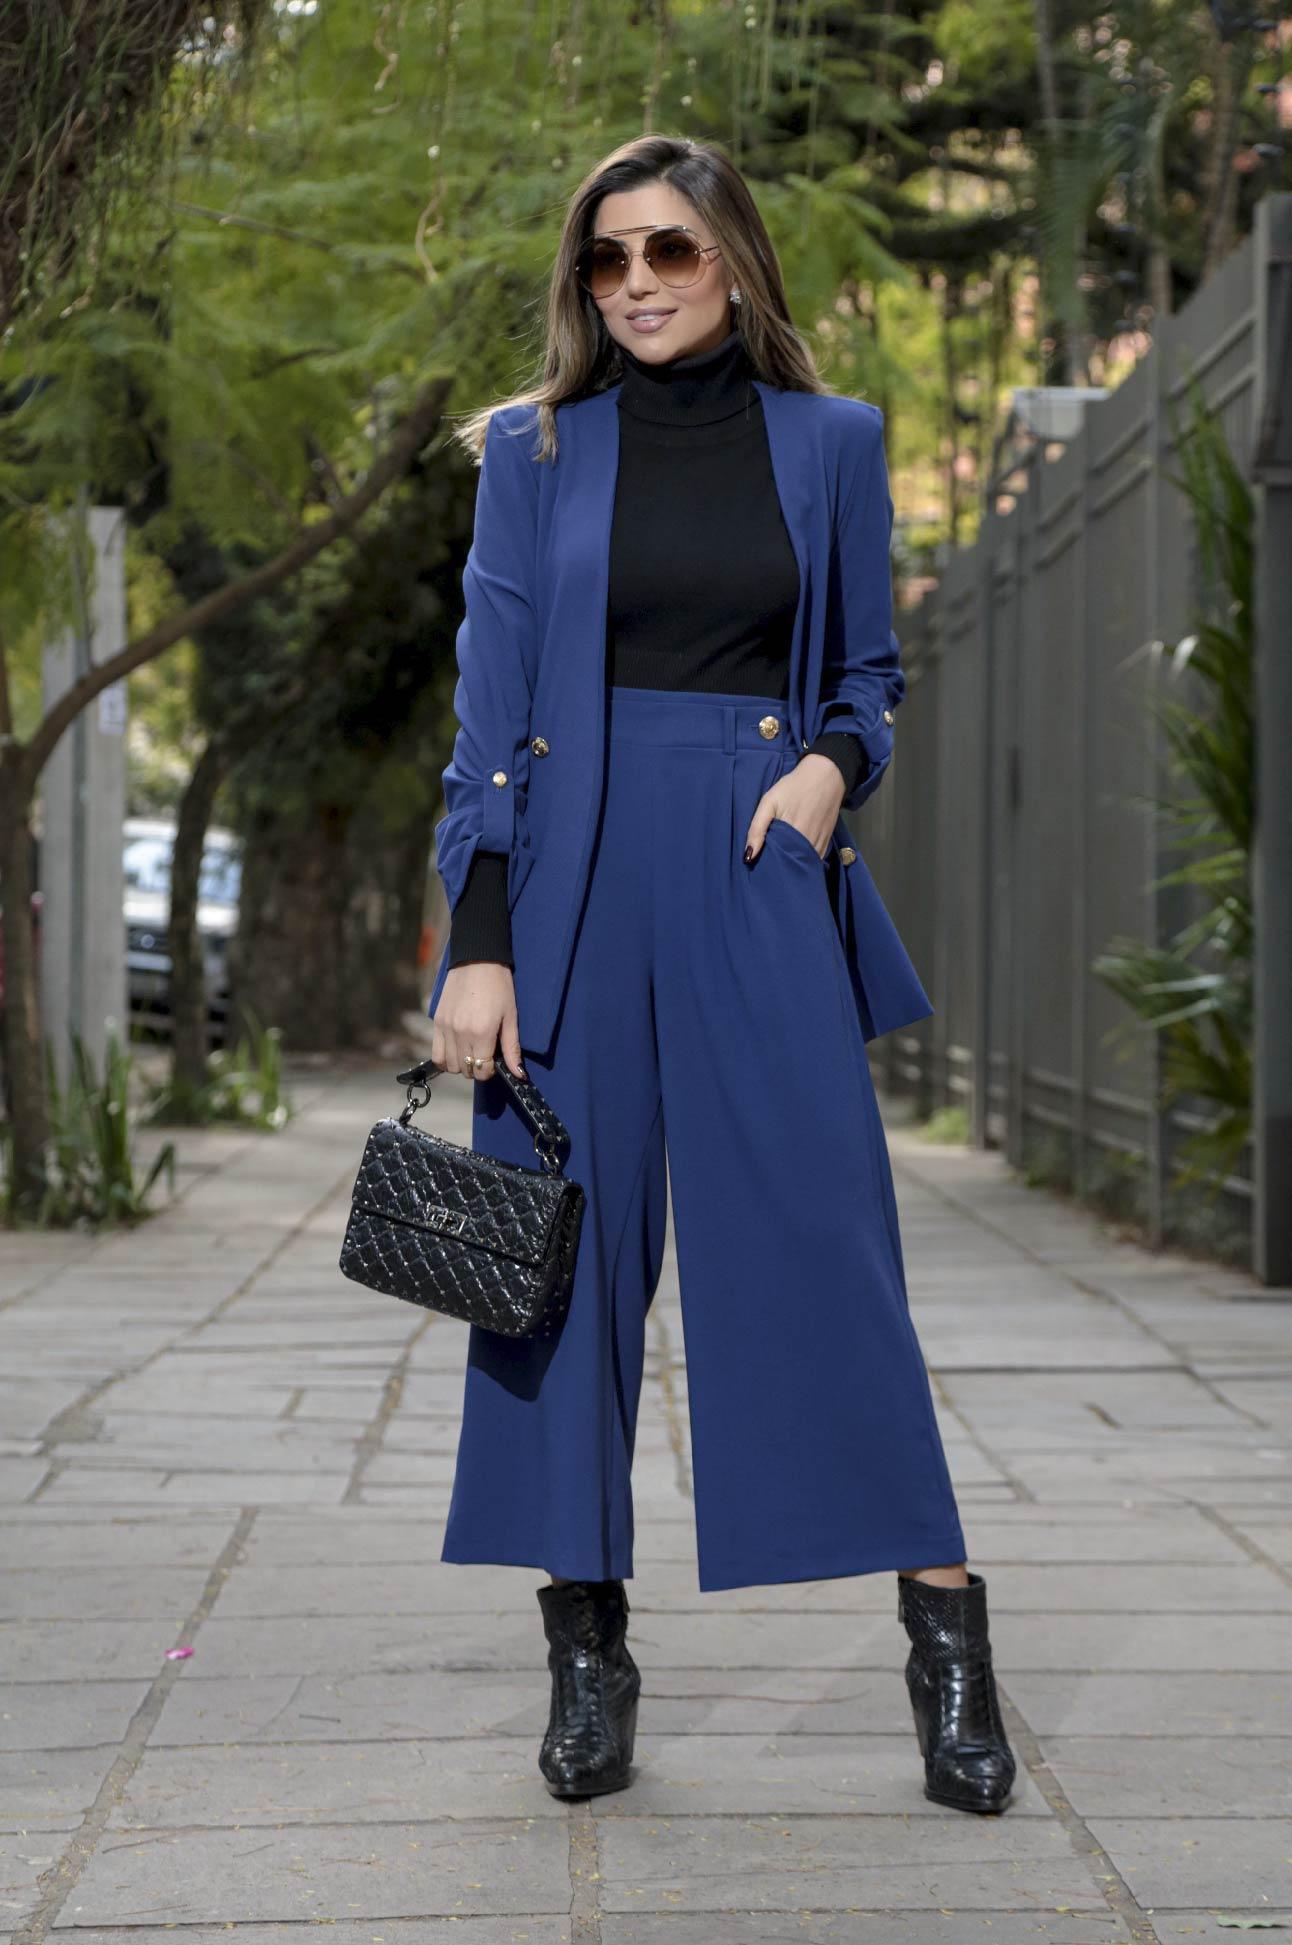 Conjunto em Alfaiataria Feminina Azul Marinho